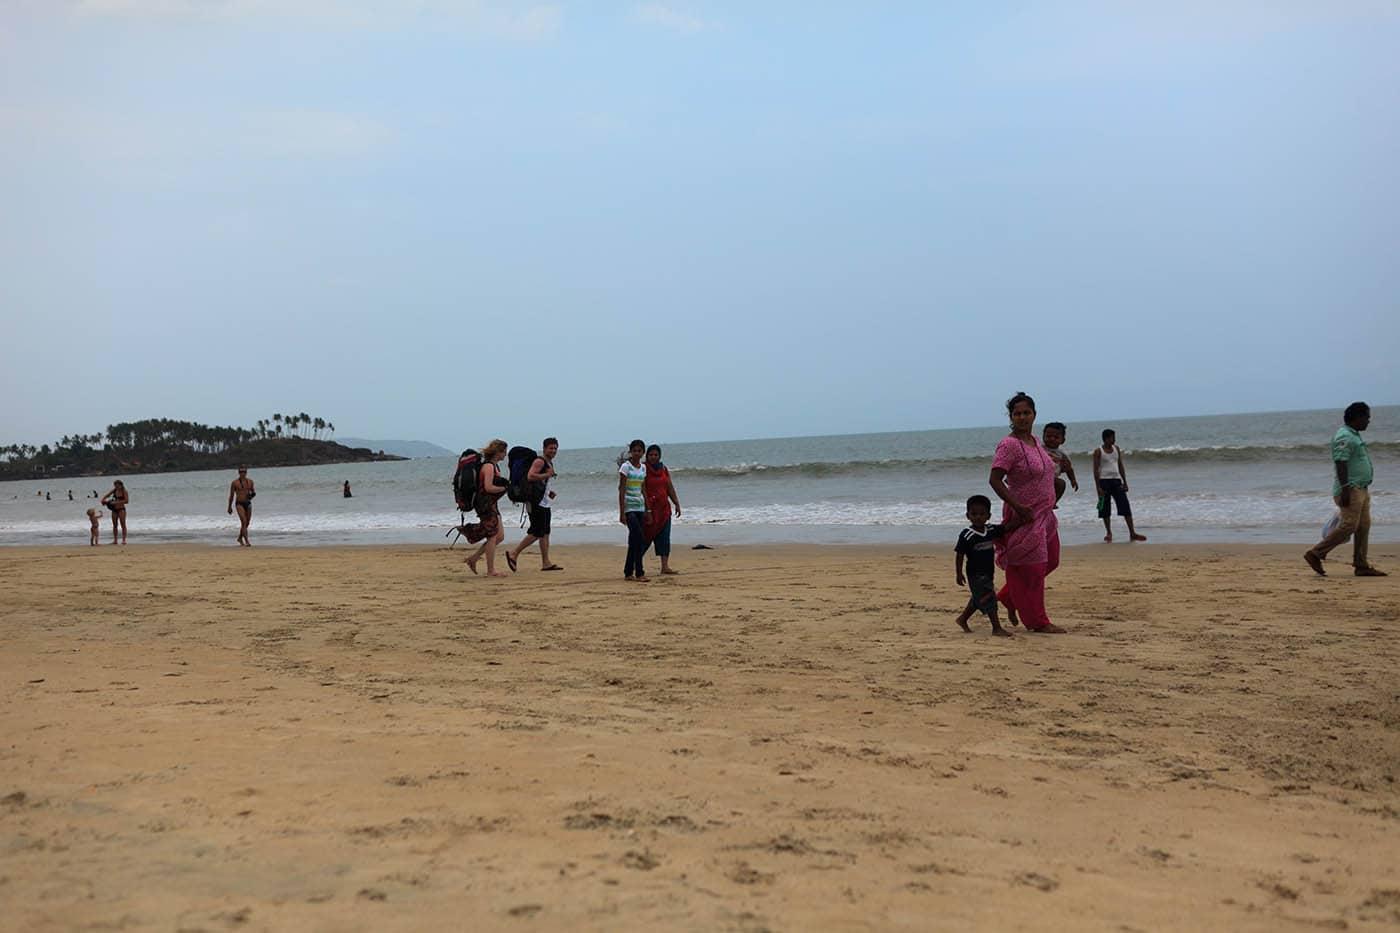 Palolem Beach in Palolem, Goa, India.